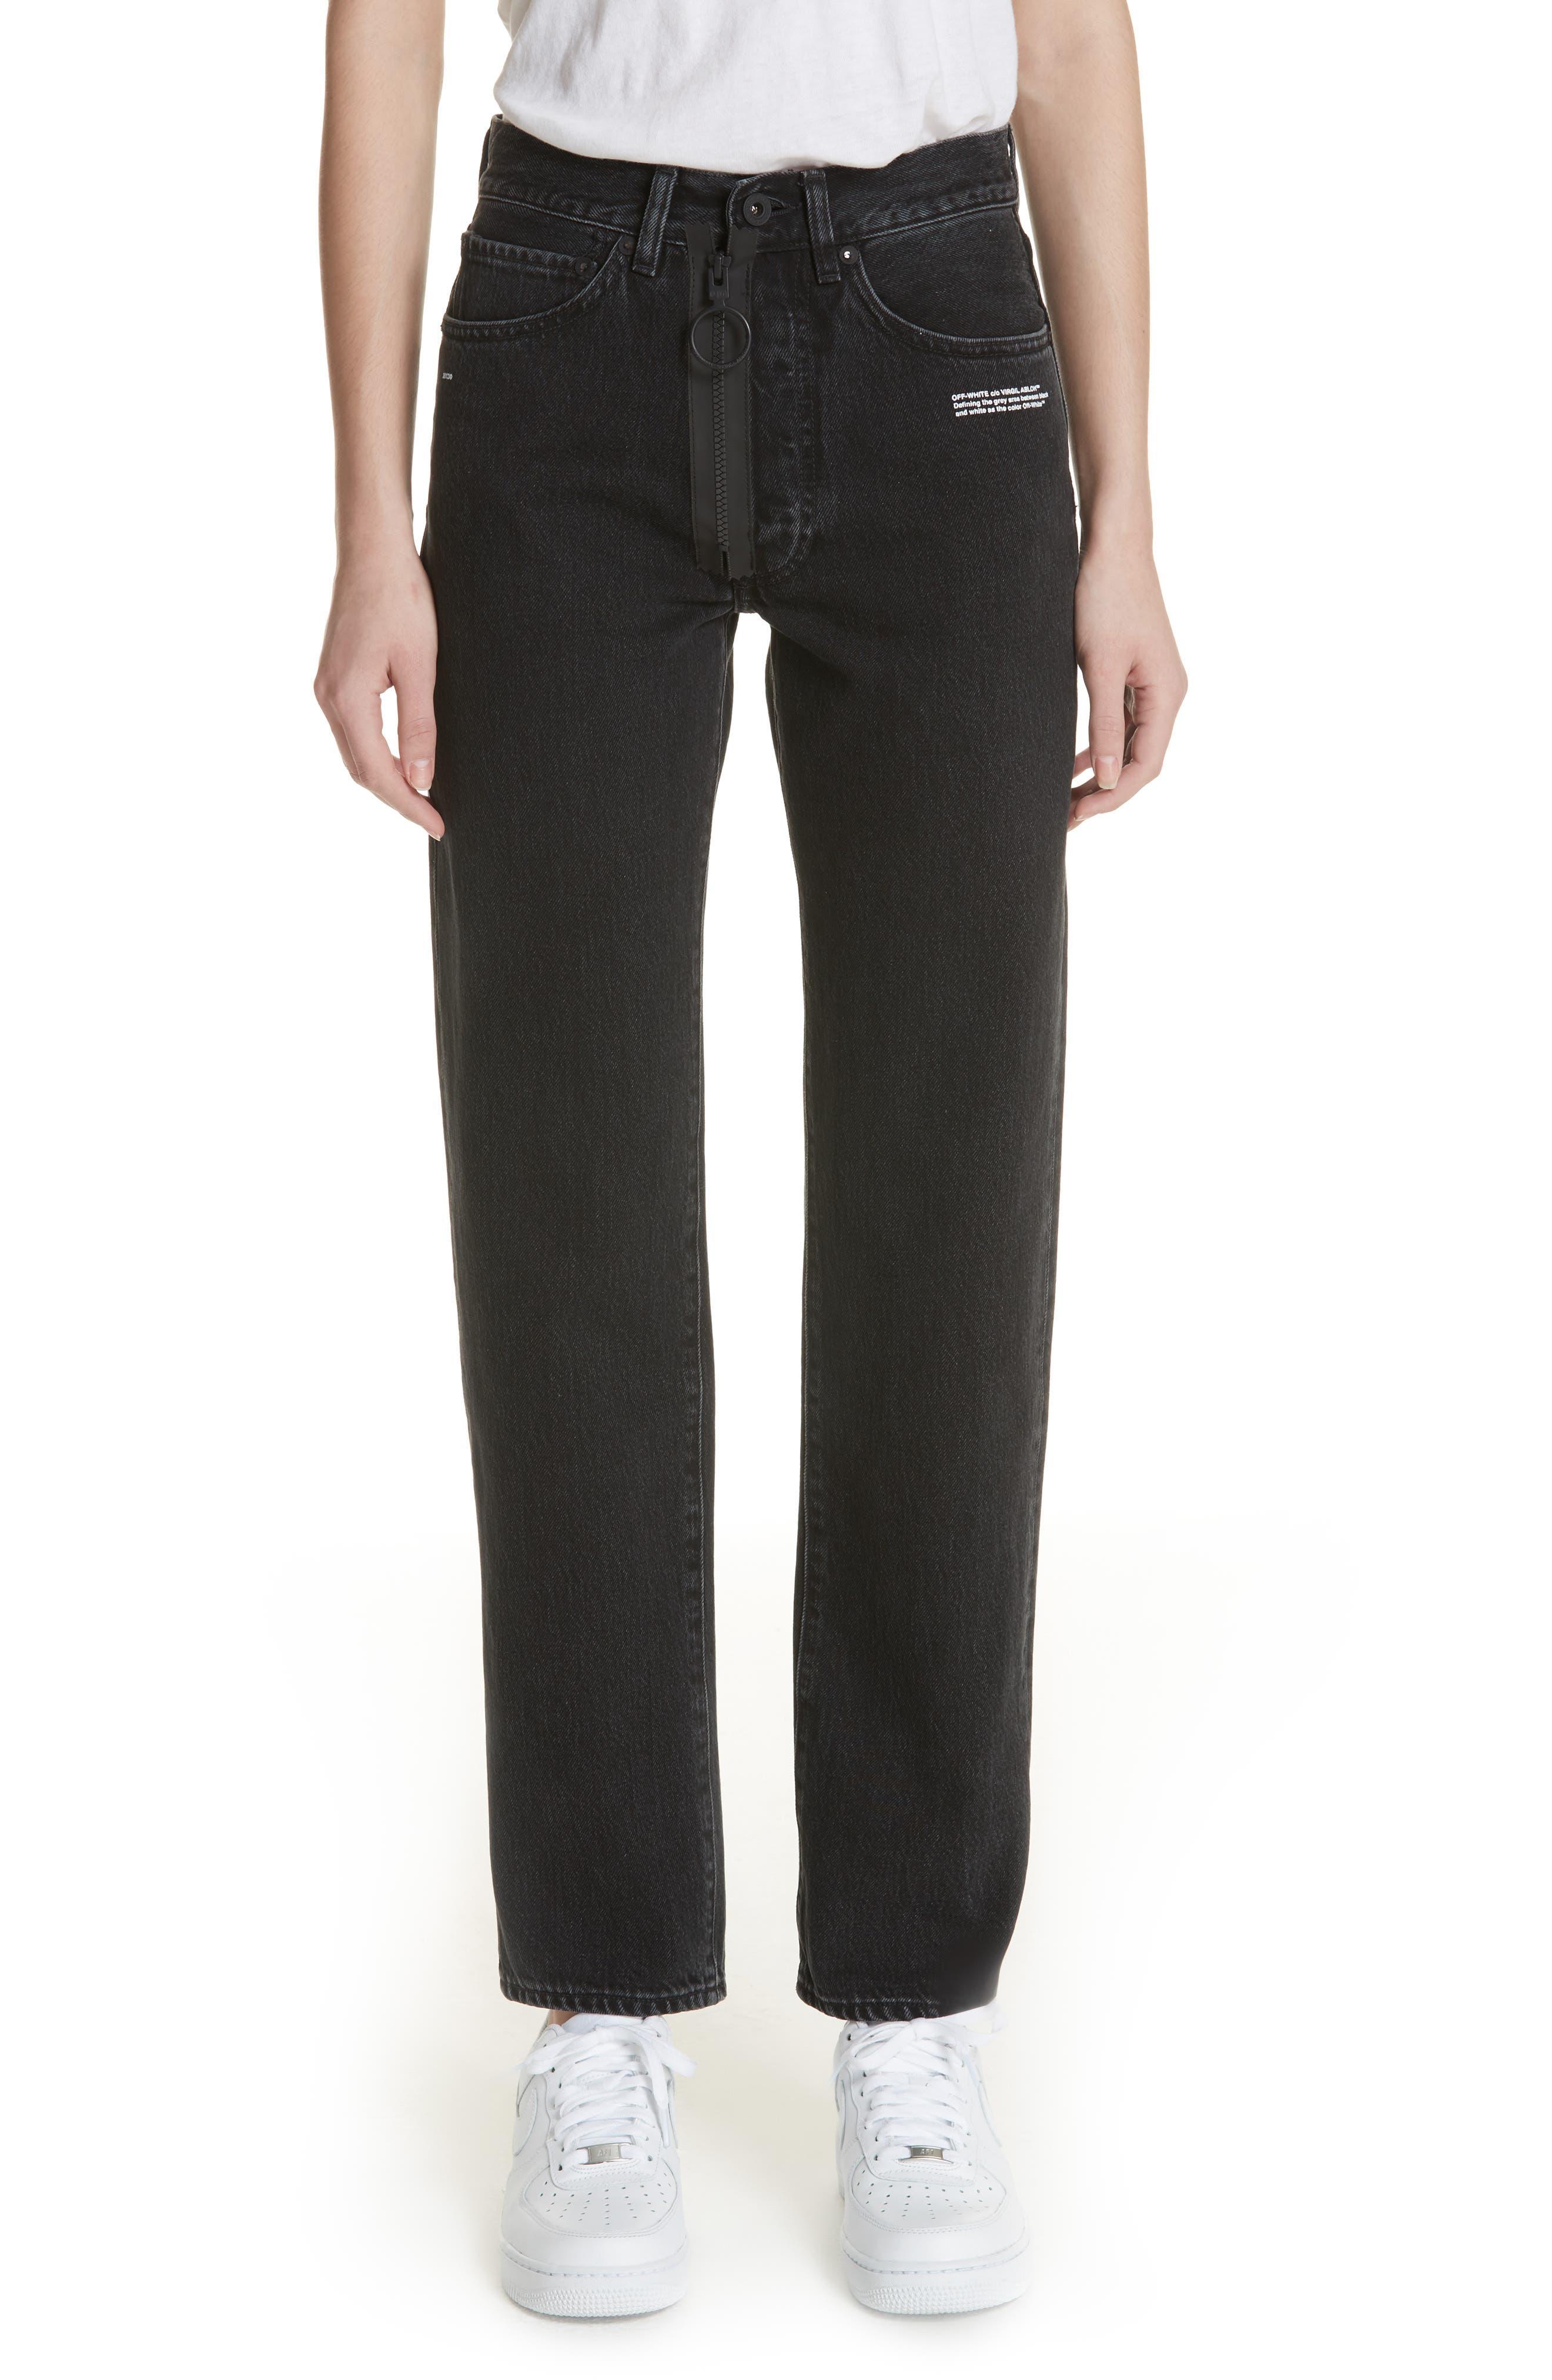 Off-White Classic Straight Leg Jeans (Vintage Black/White)